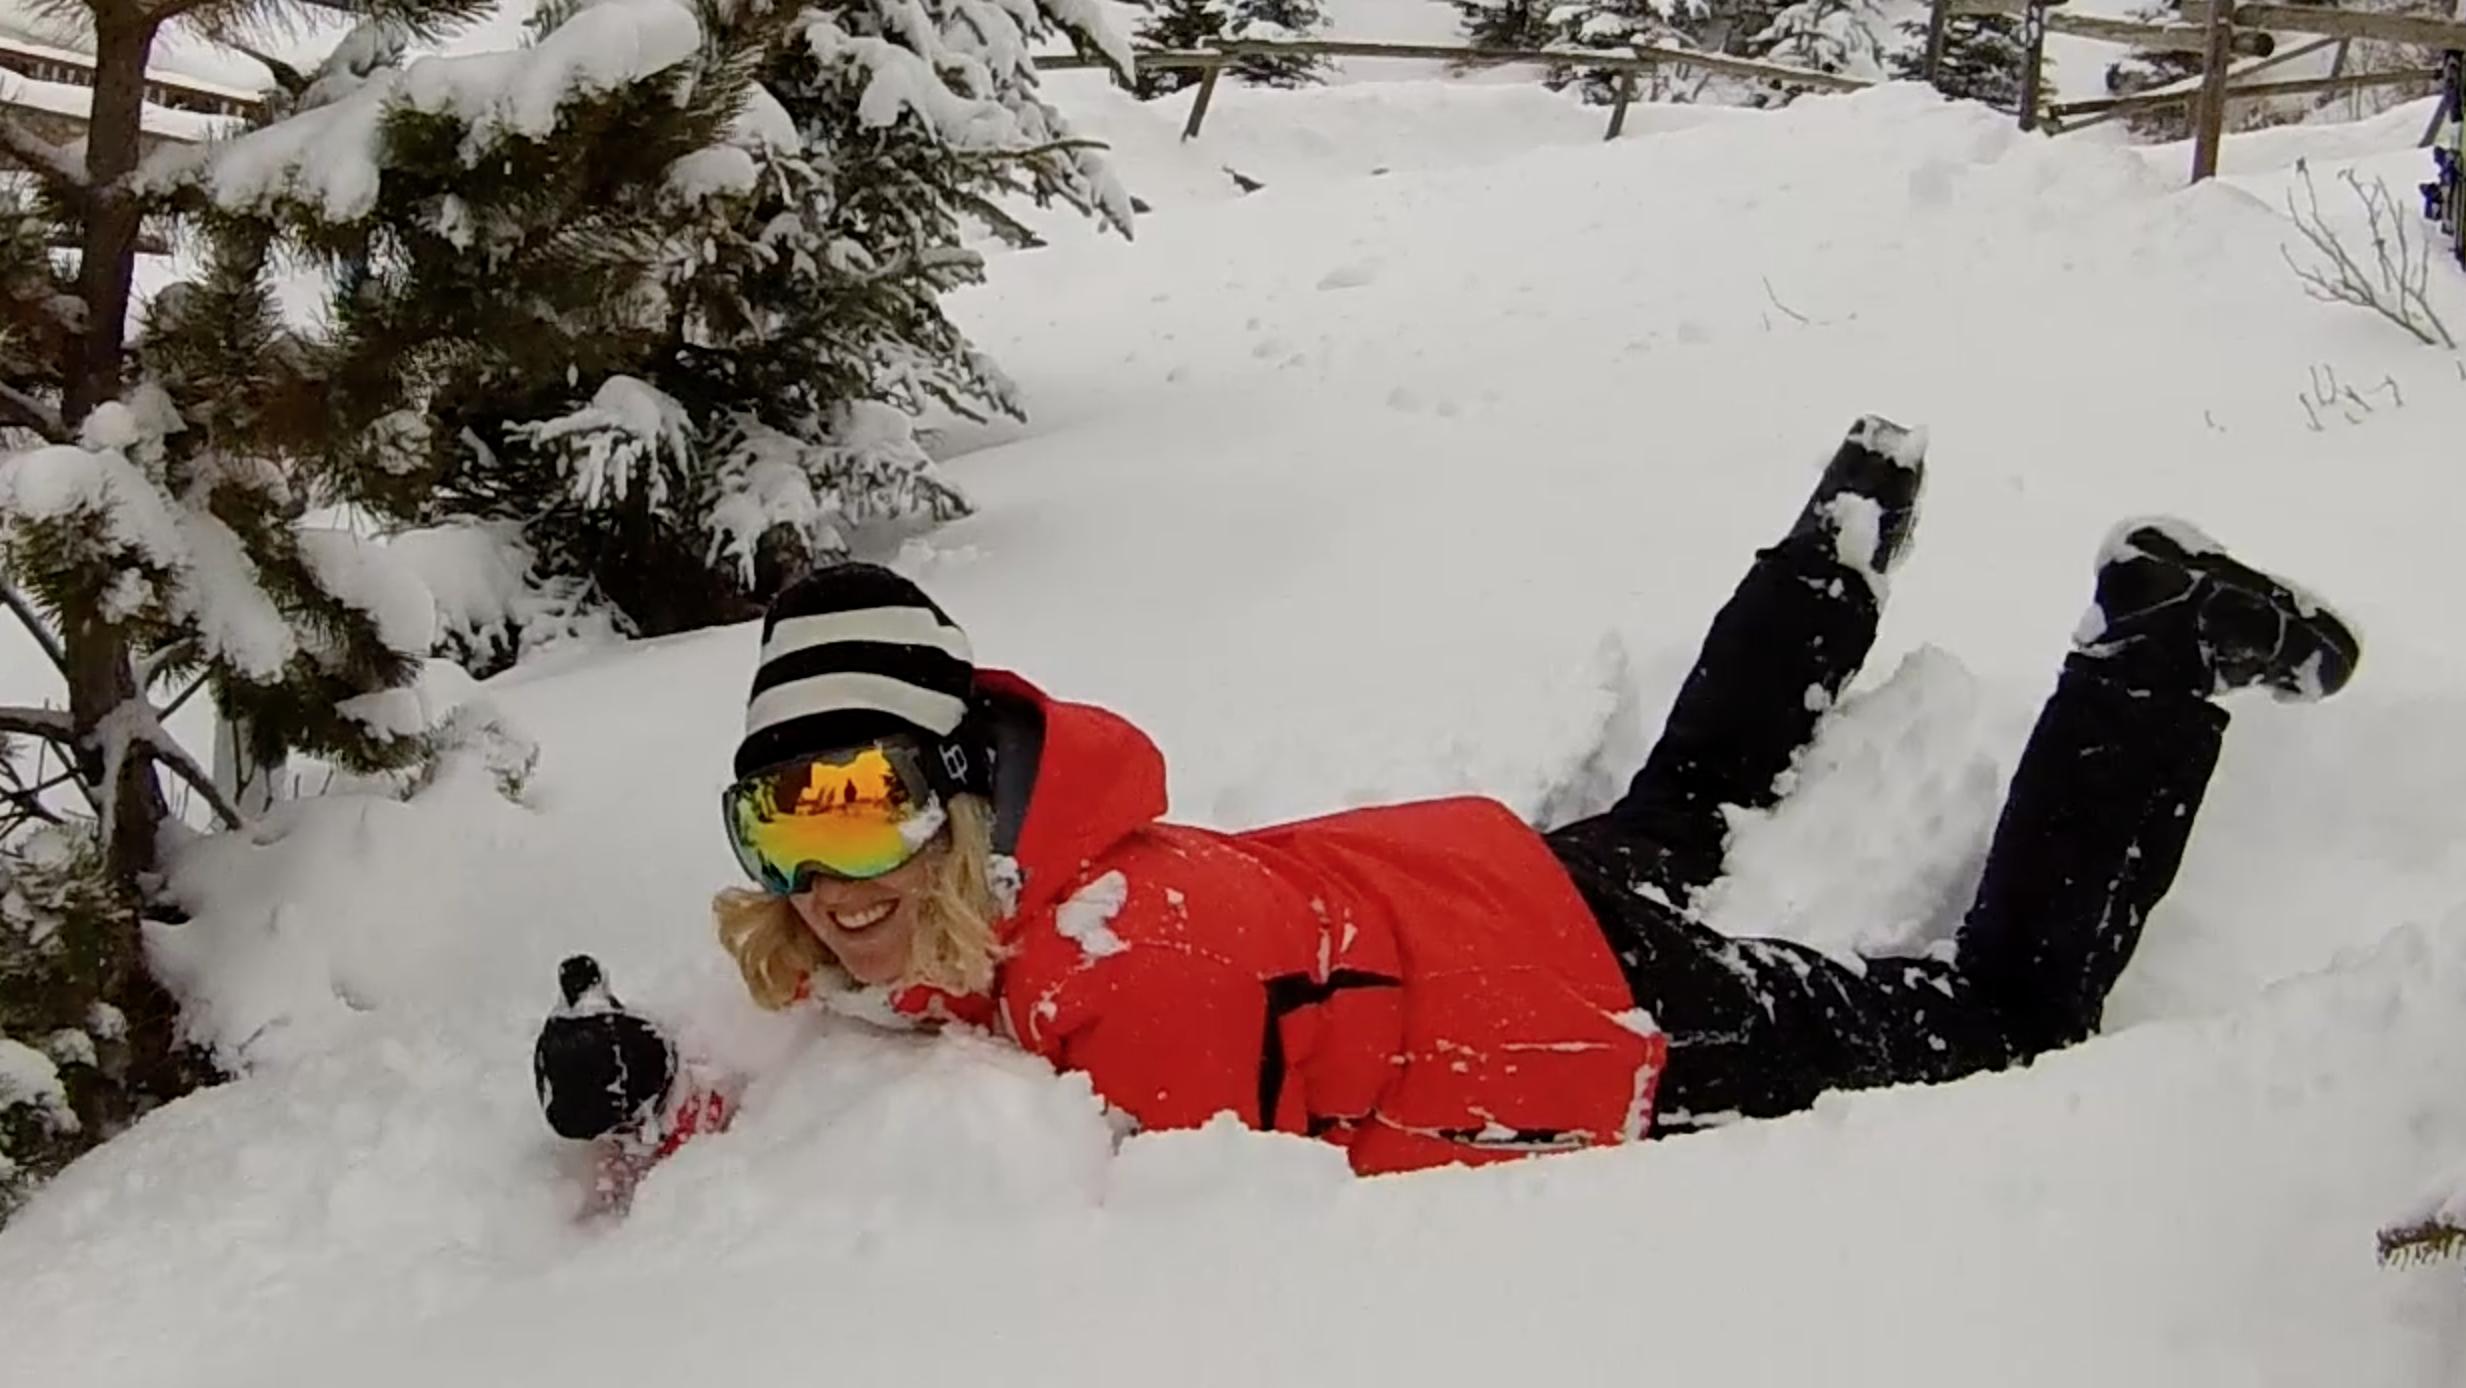 Met Mountain Peak skikleding de sneeuw in